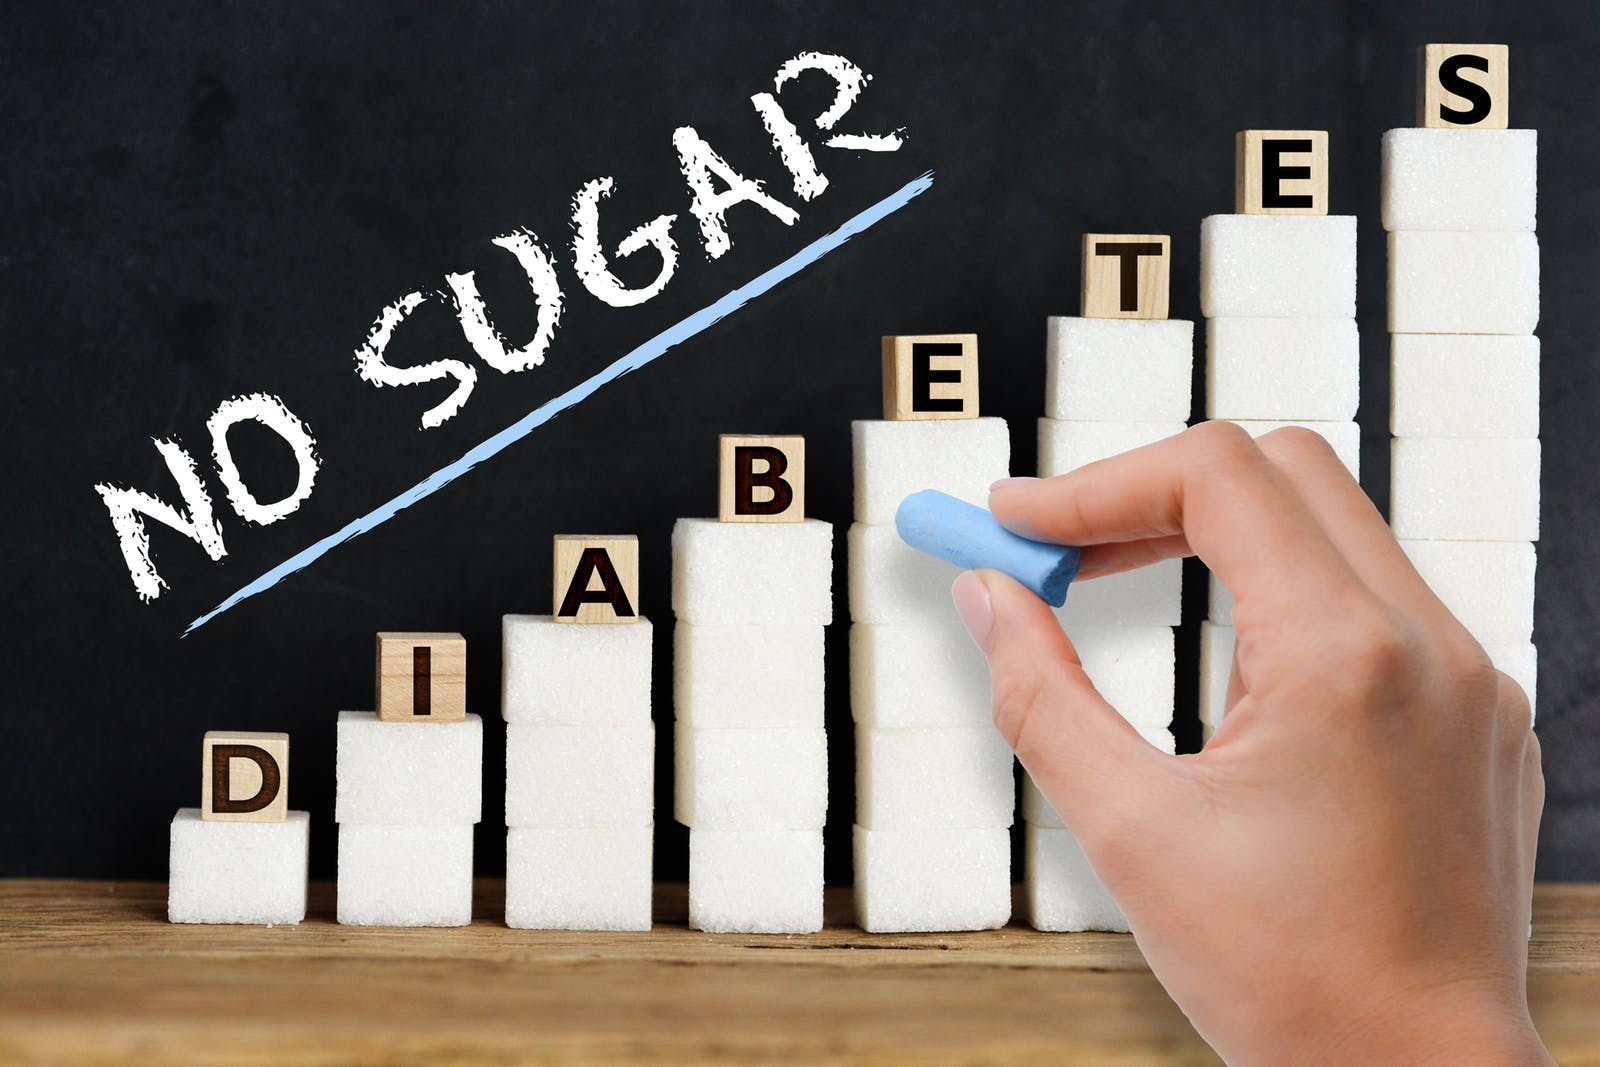 No sugar advice handwritten on blackboard above sugar cubes scale, suggesting diabetes risk